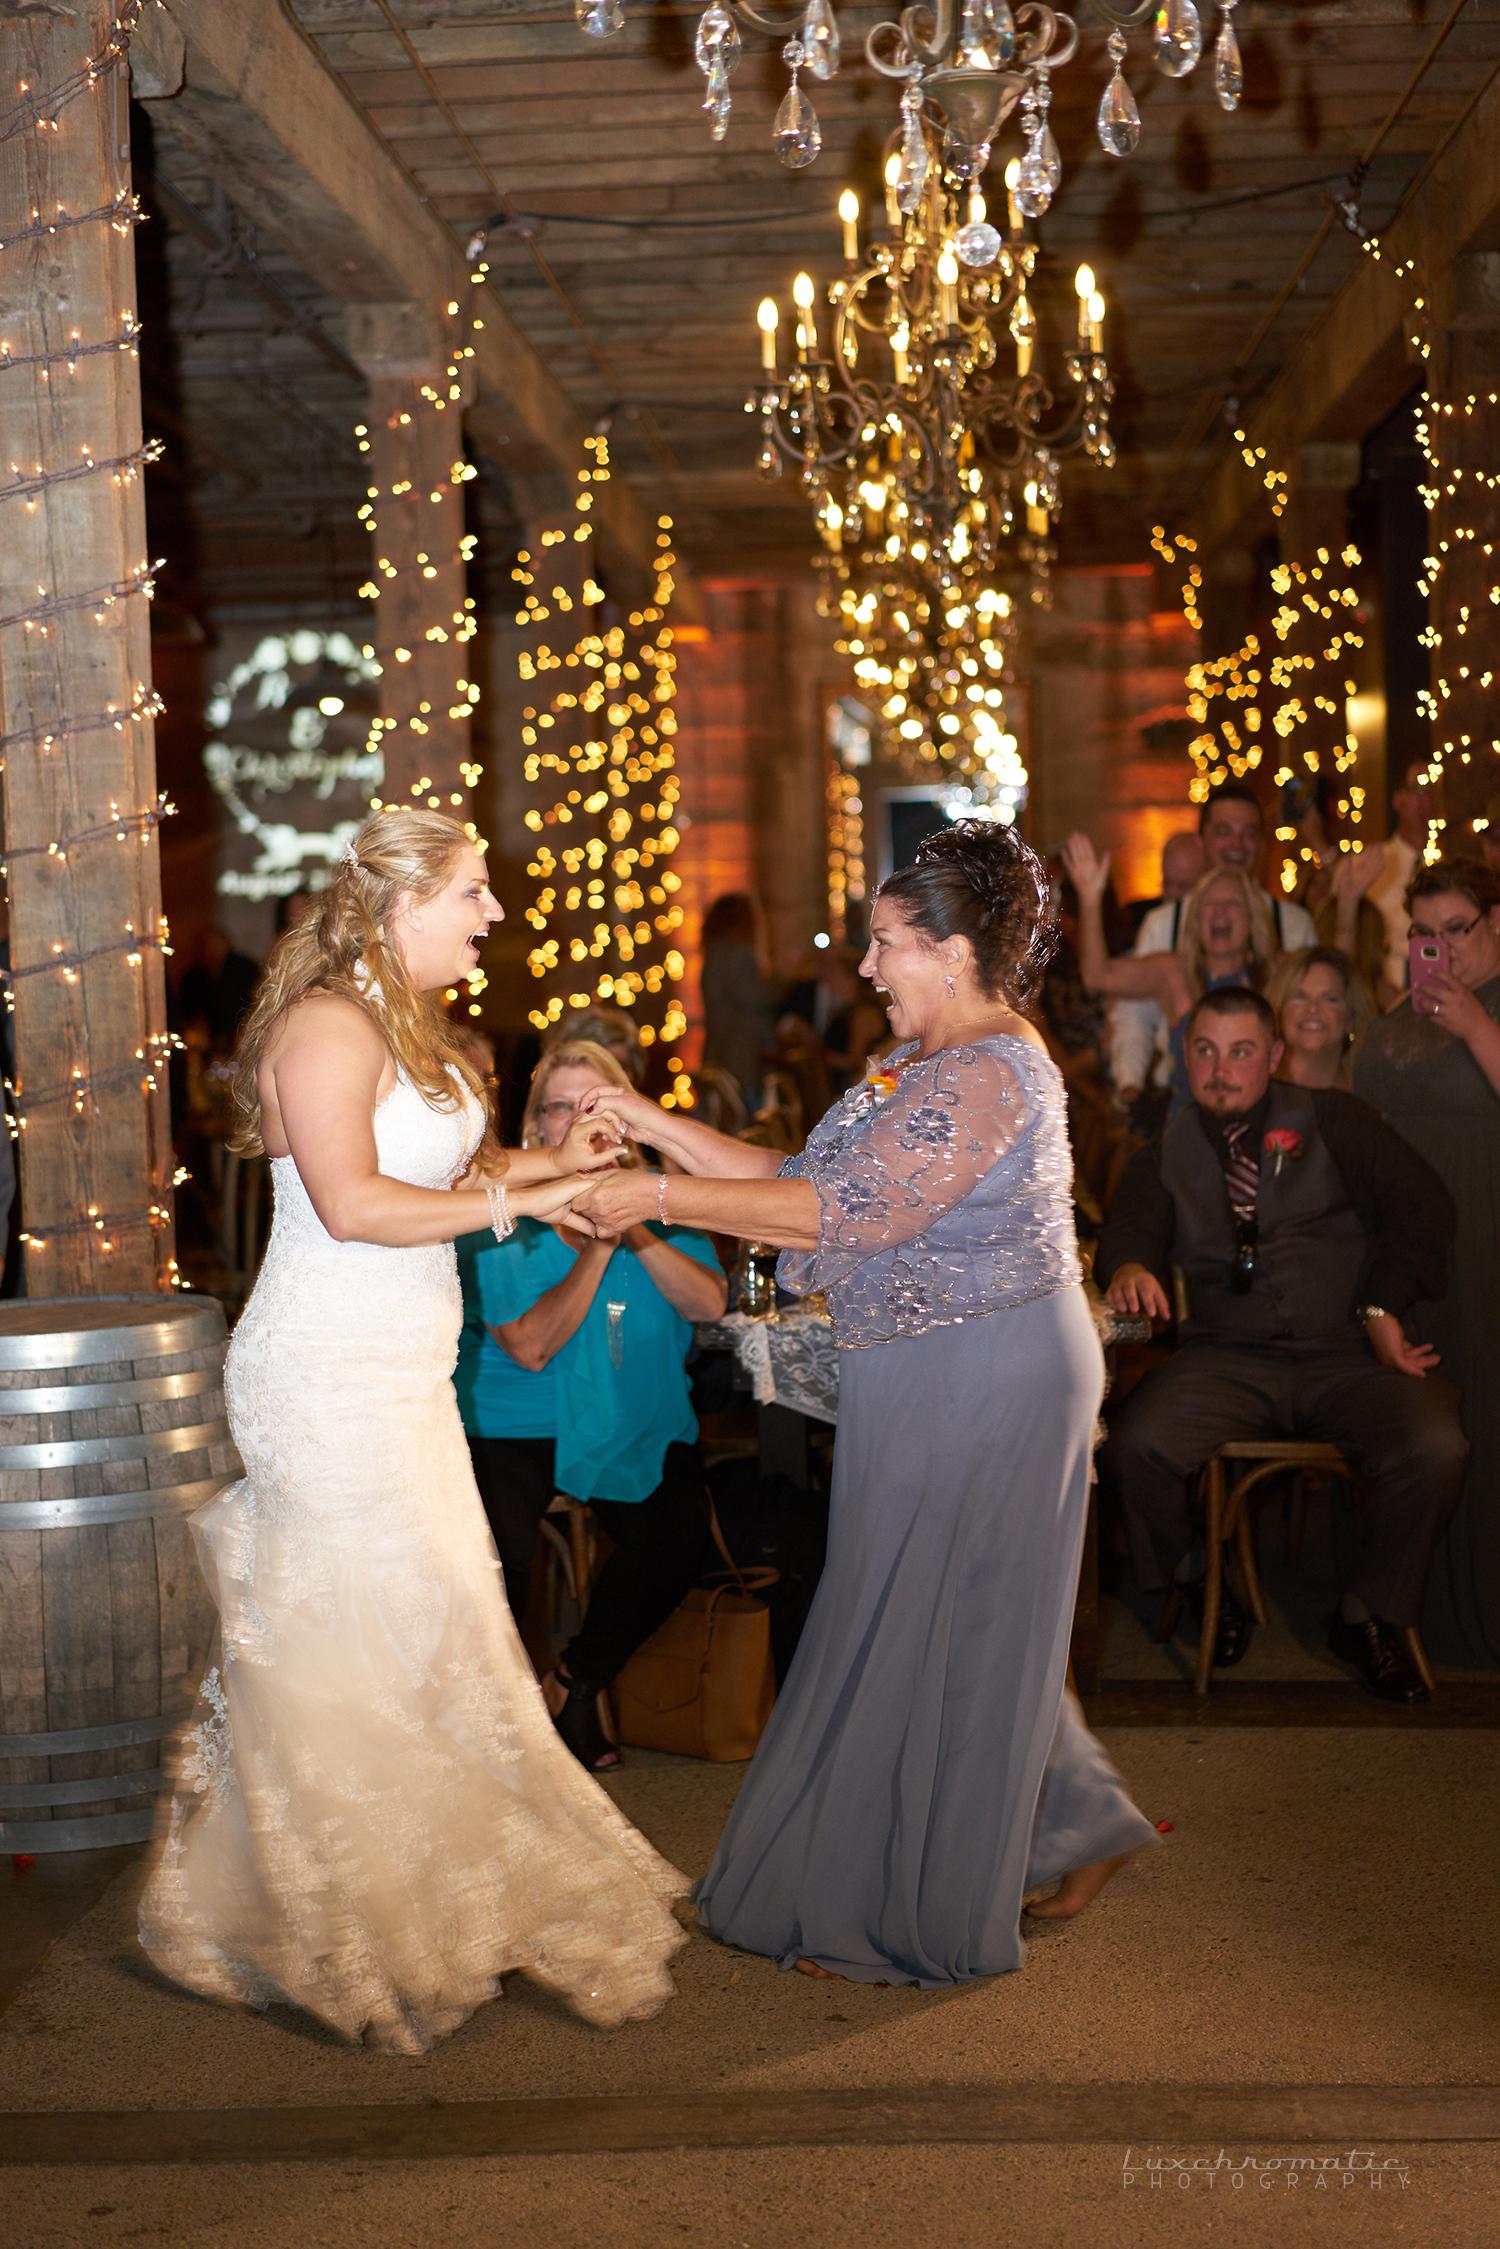 081217_Rachel_Chris_a1089-weddingdress-bride-weddingphotography-weddingphotographer-bridal-groom-wedding-engagementring-proposal-brides-diamondring-sonyalpha-sony-sonya9-sonya7rii-sanfrancisco-sf-bayarea-photographer-profoto-murrietas-well.jpg